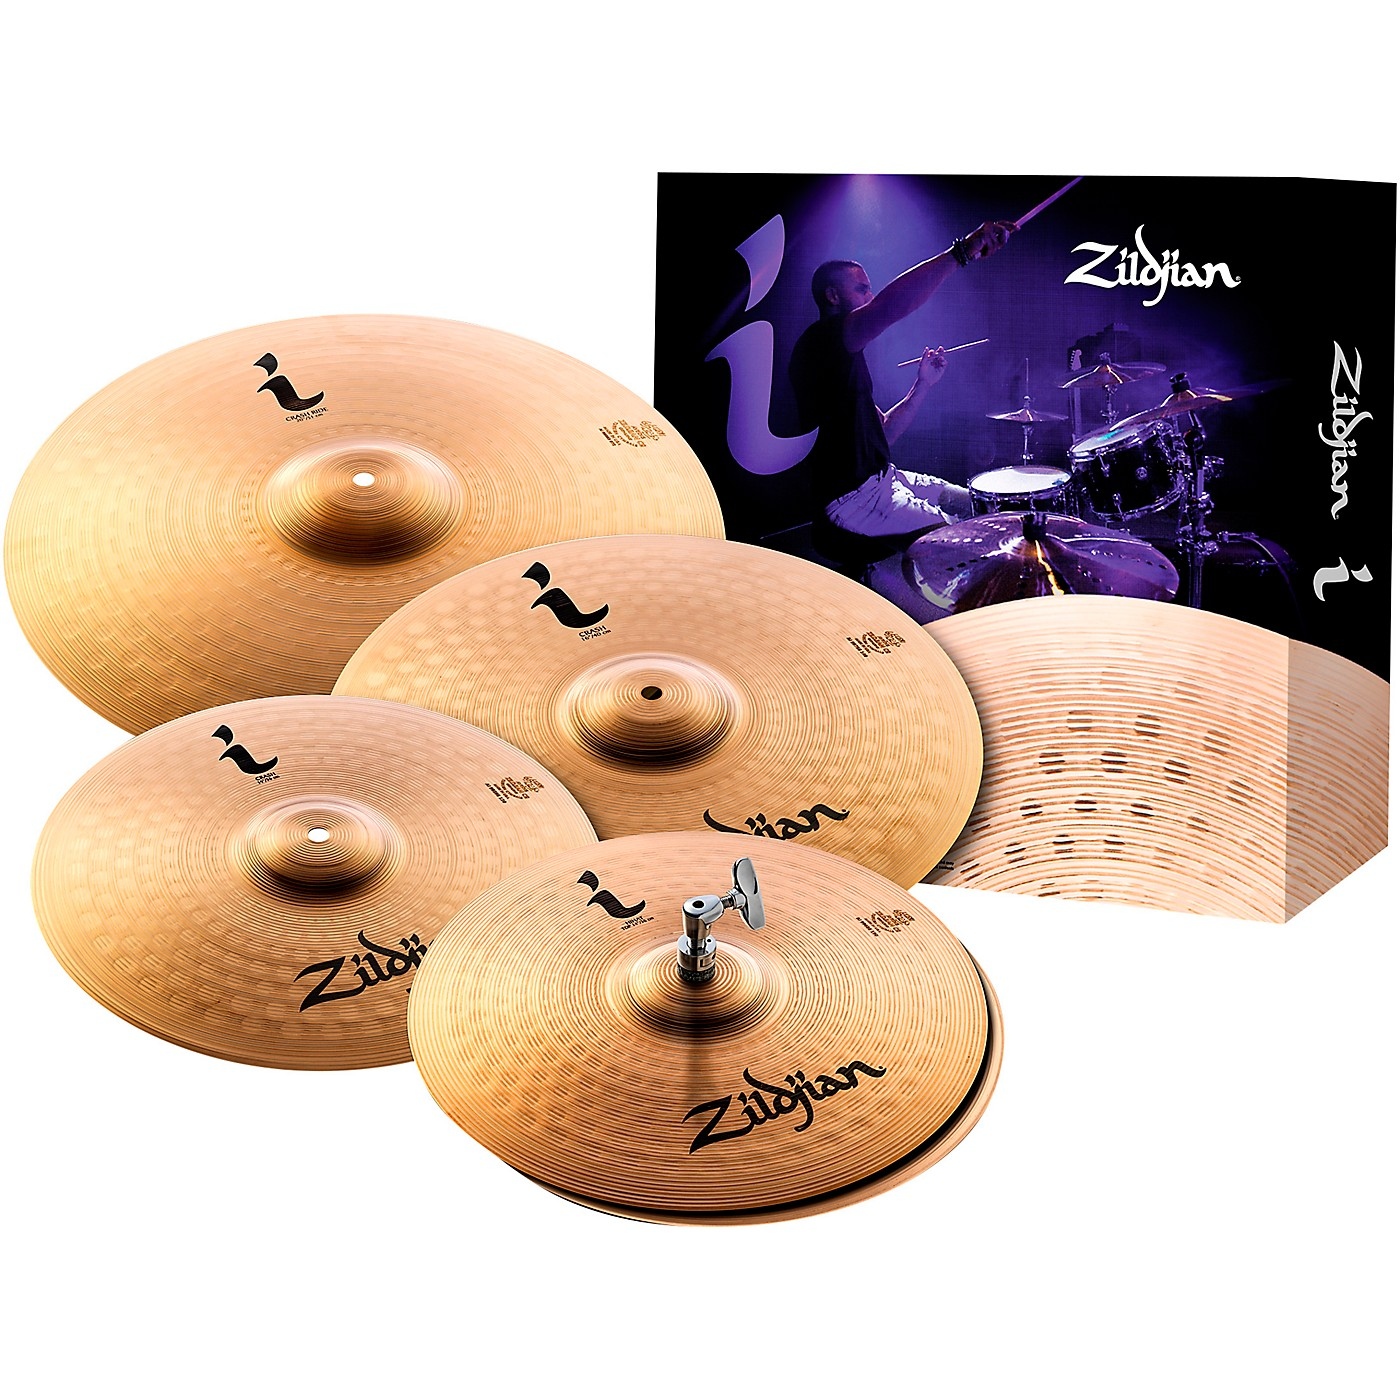 Zildjian I Series Pro Cymbal 5 Pack thumbnail